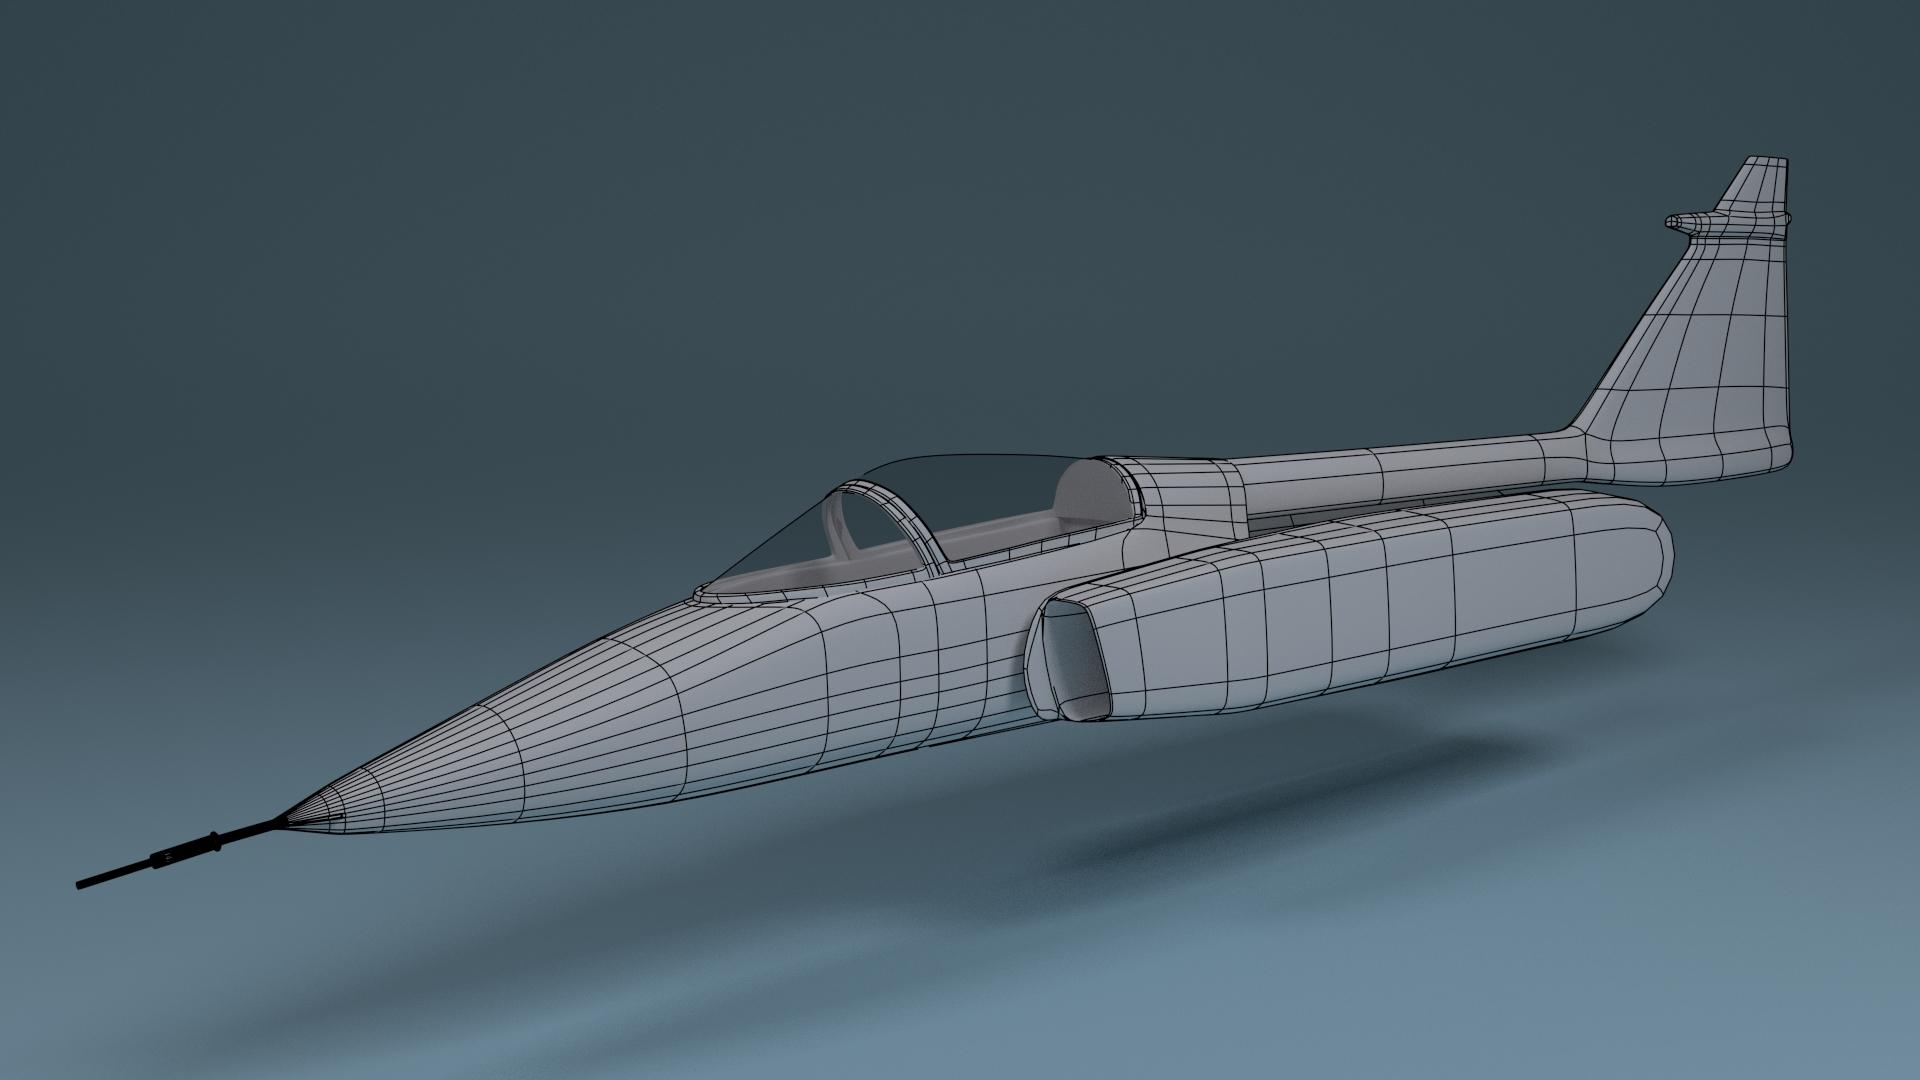 Saab JAS 10 Gripen   Works in Progress   Blender Artists Community